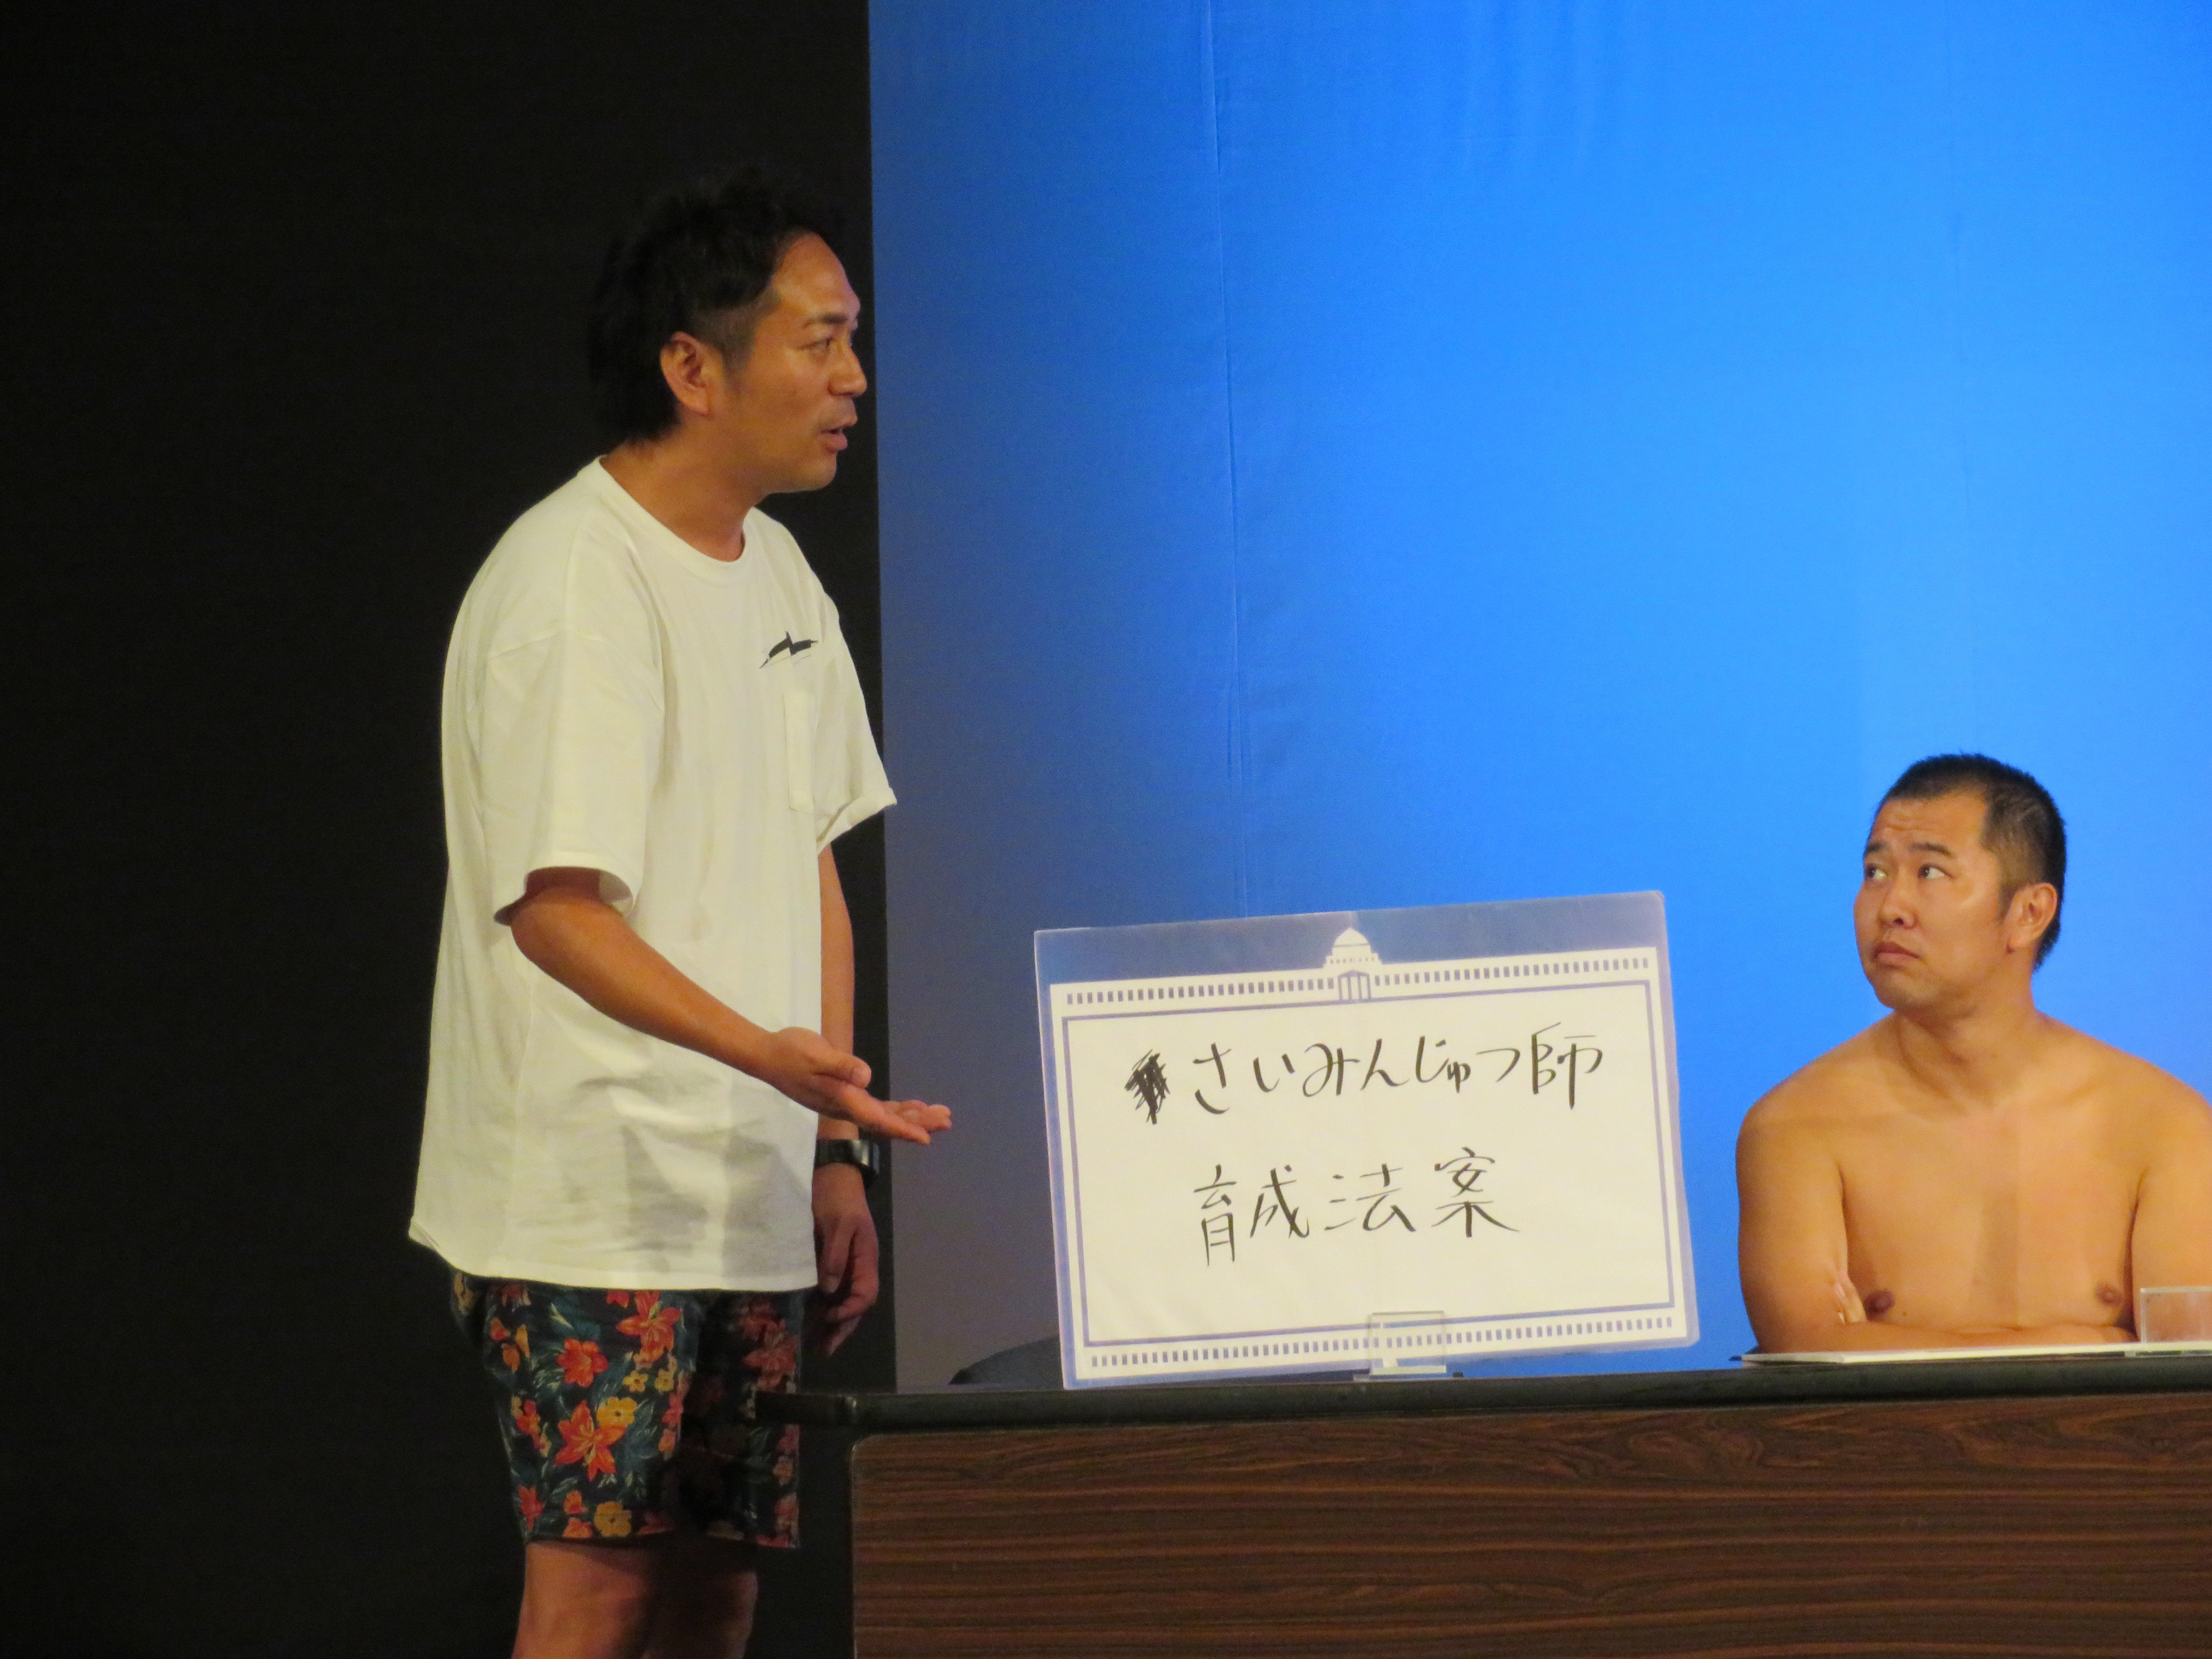 http://news.yoshimoto.co.jp/20170803163203-2a4c9bbb261364c4bb3f29454890926e614350f1.jpg